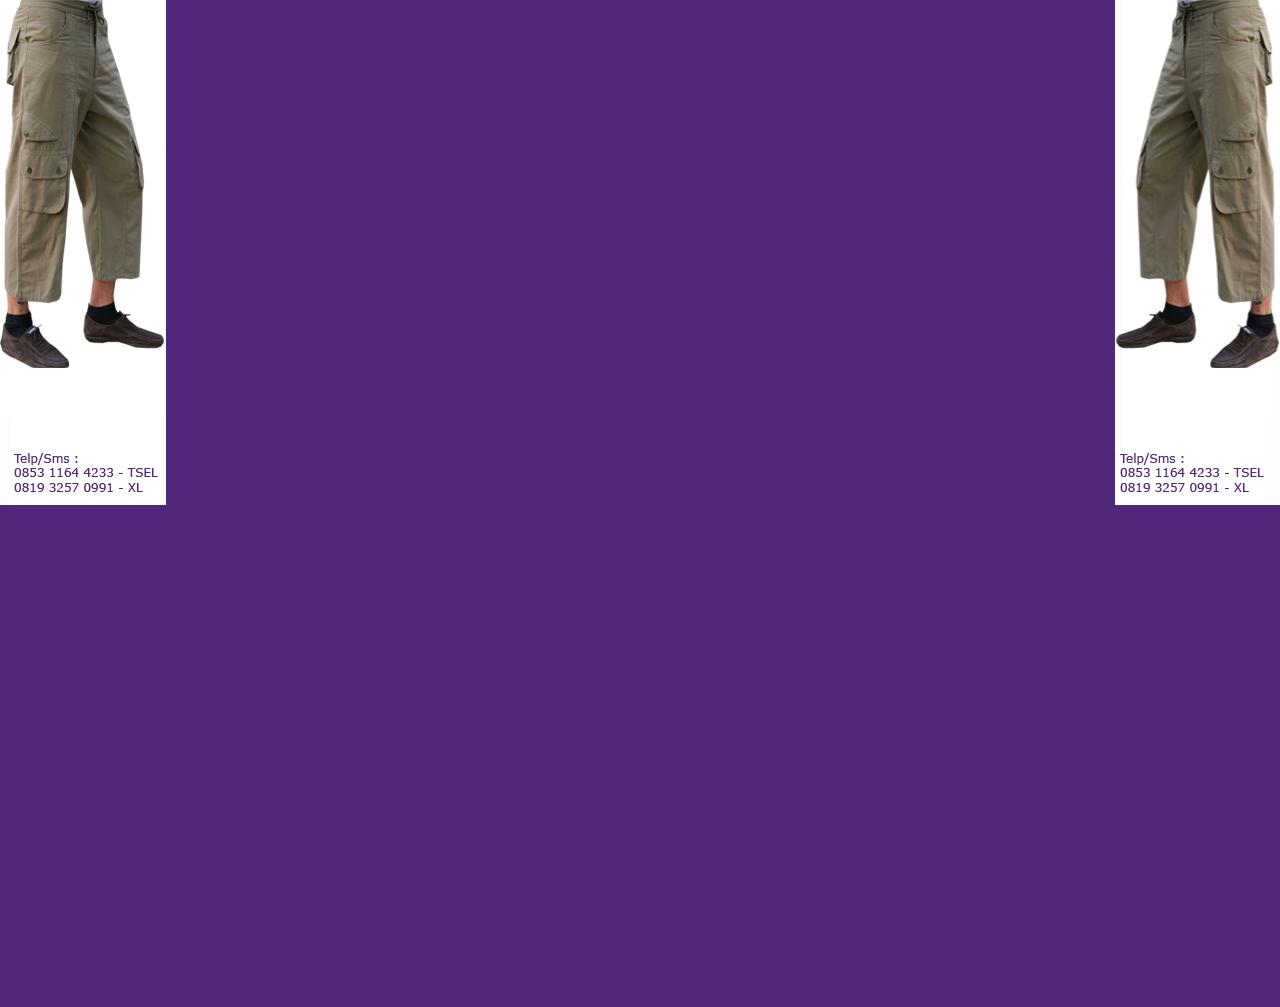 Background Sc Copy1 Jpg Aneka Sirwal Celana Pangsi Baju Koko Gamis Pakistan Ikhwan Jubah Saudi Jubah Maroko Stelan Gamis Anak Jubah Anak Sirwal Boxer Sirwal Boxer Loreng Jaket